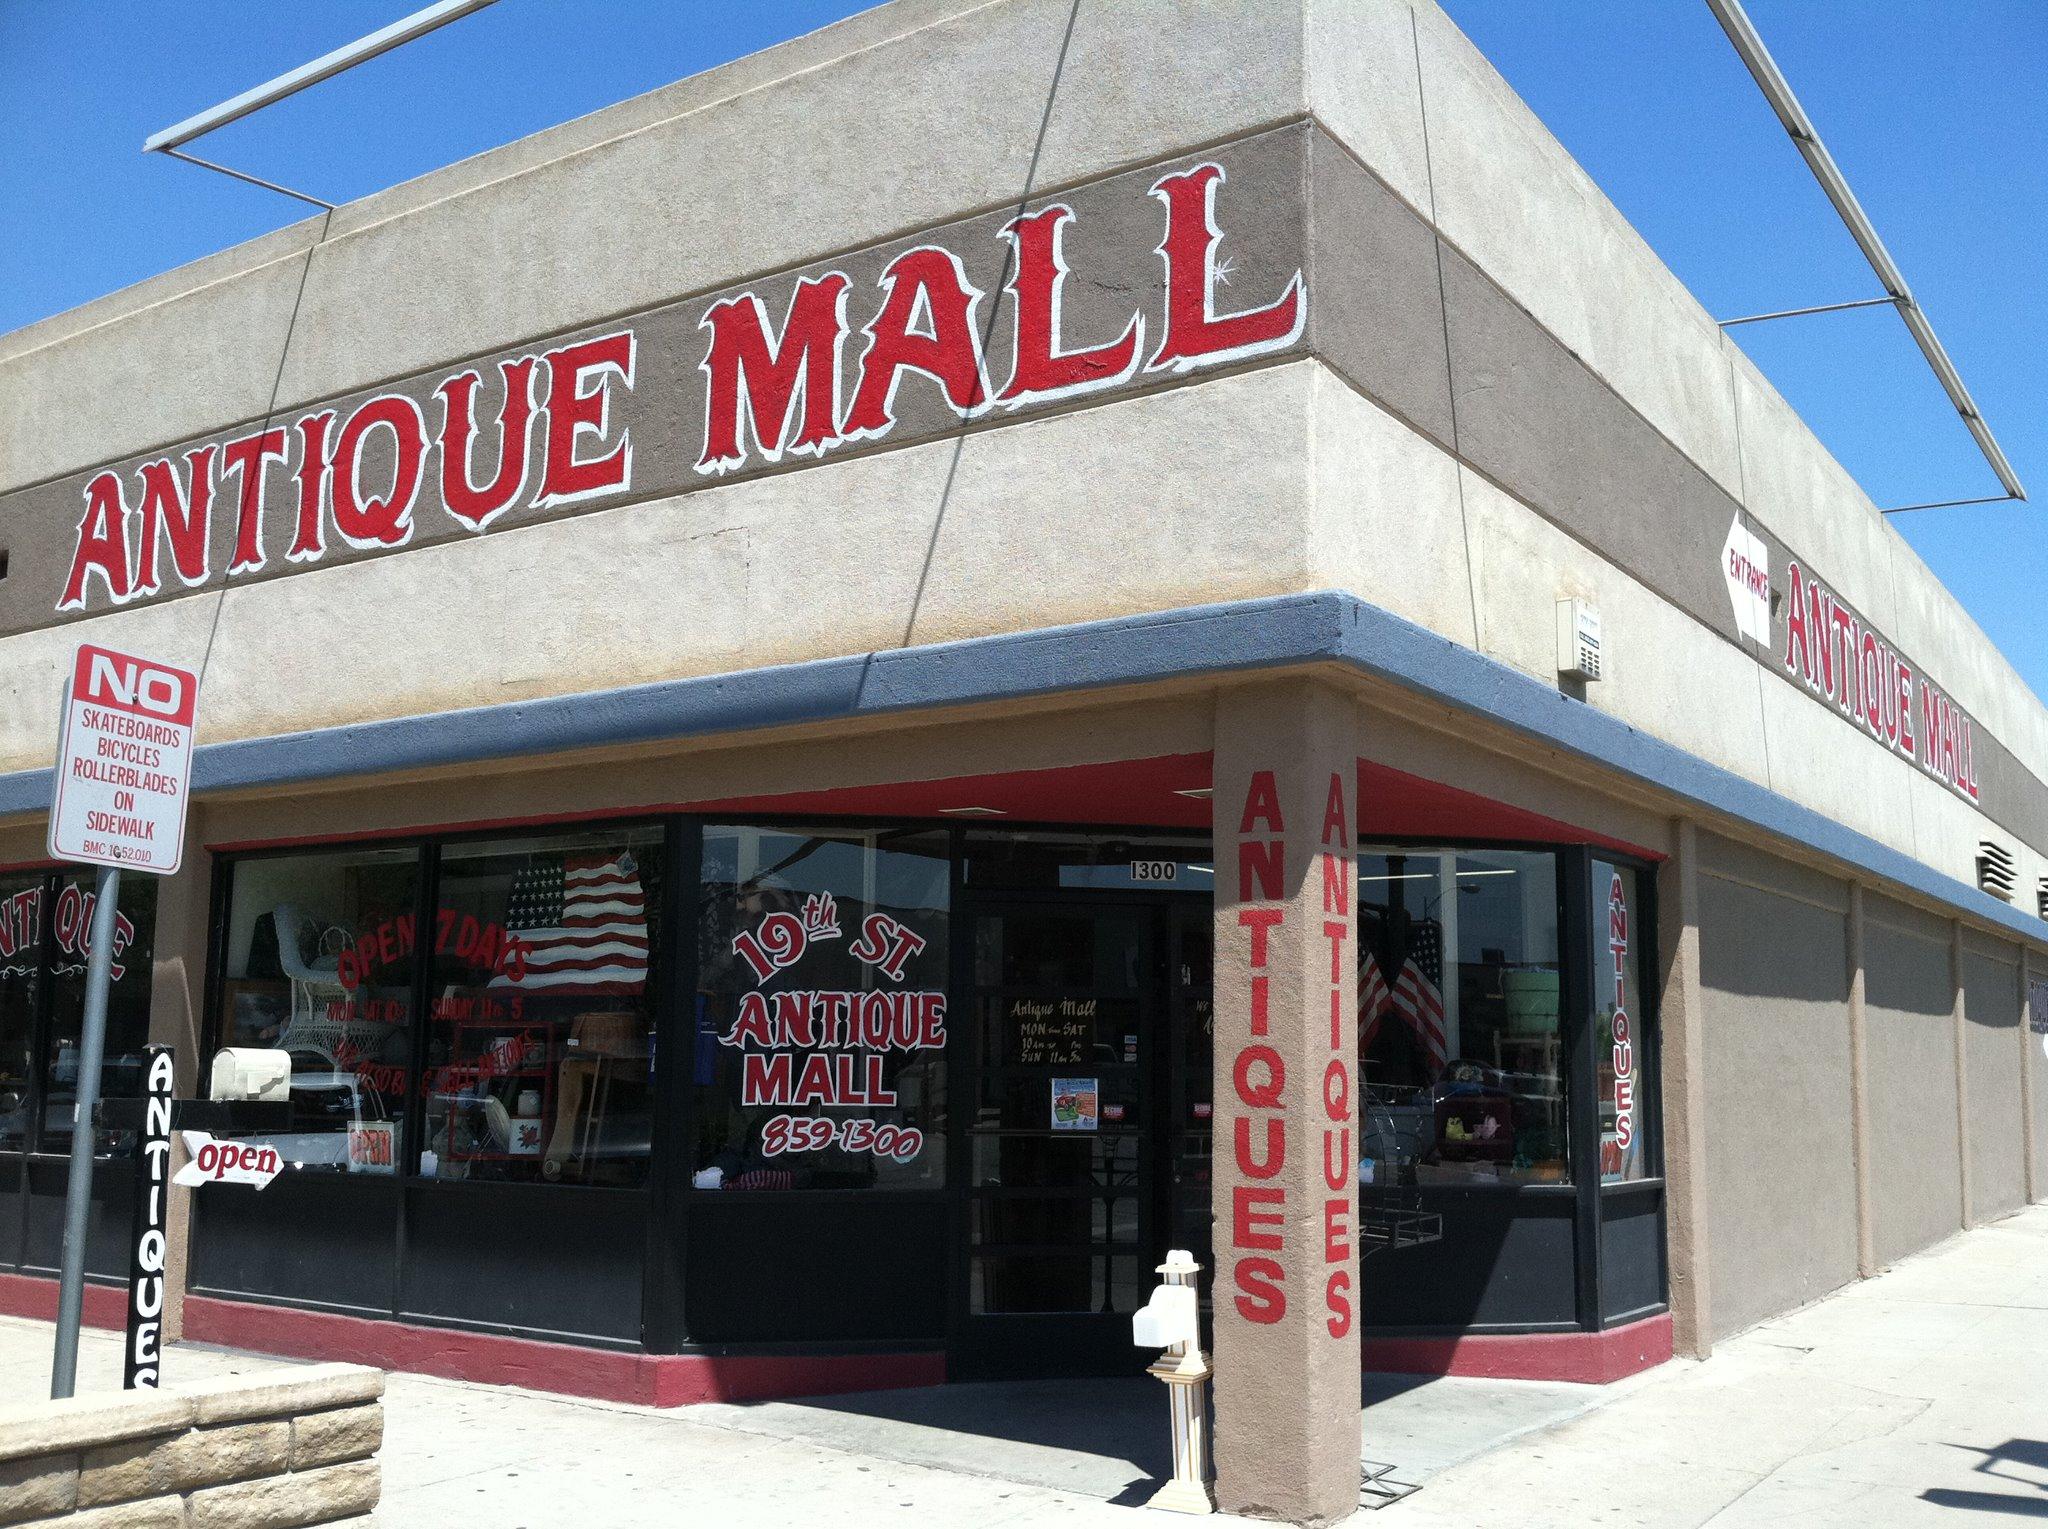 19th Street Antique Mall